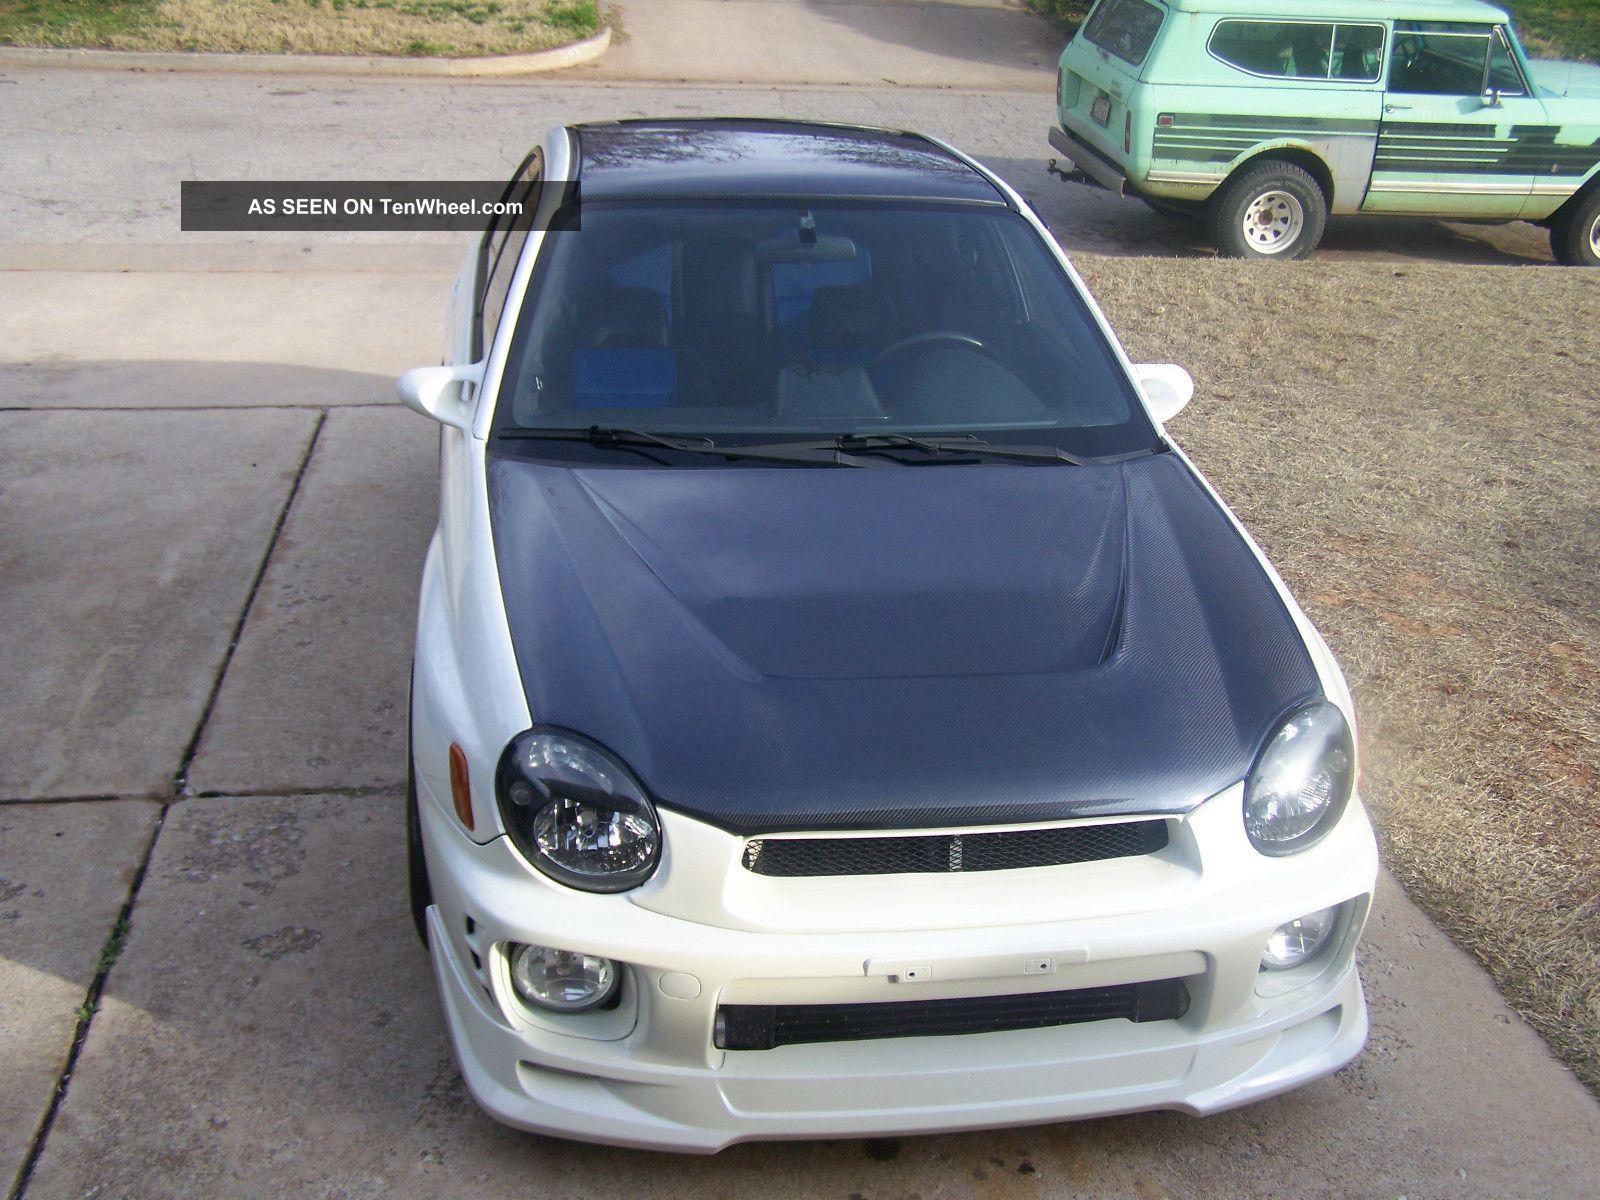 2002 Subaru Wrx Sti Complete Swap Show Car